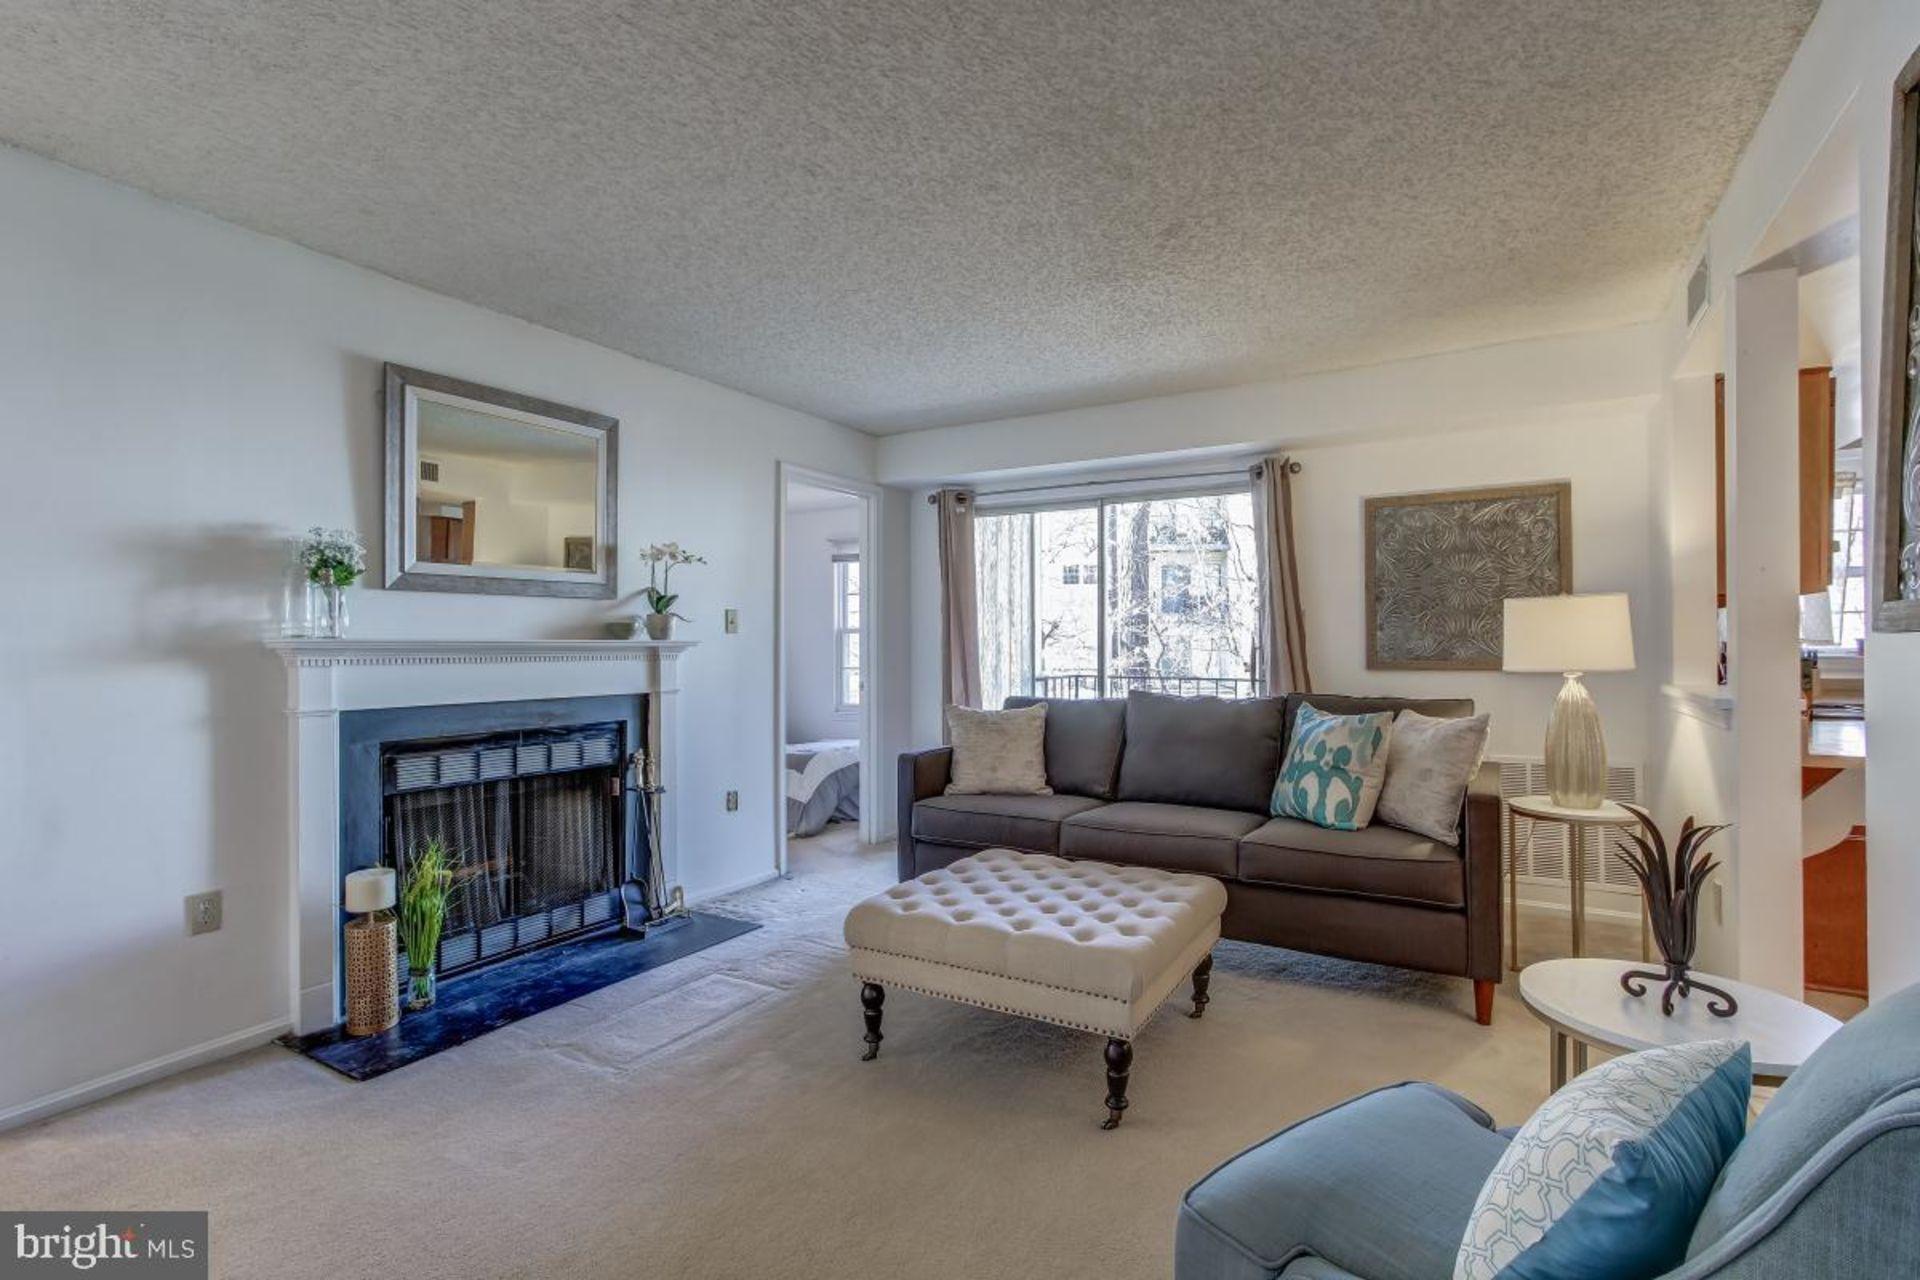 Just Listed 2 Bedroom Condo in Woodbridge, VA!